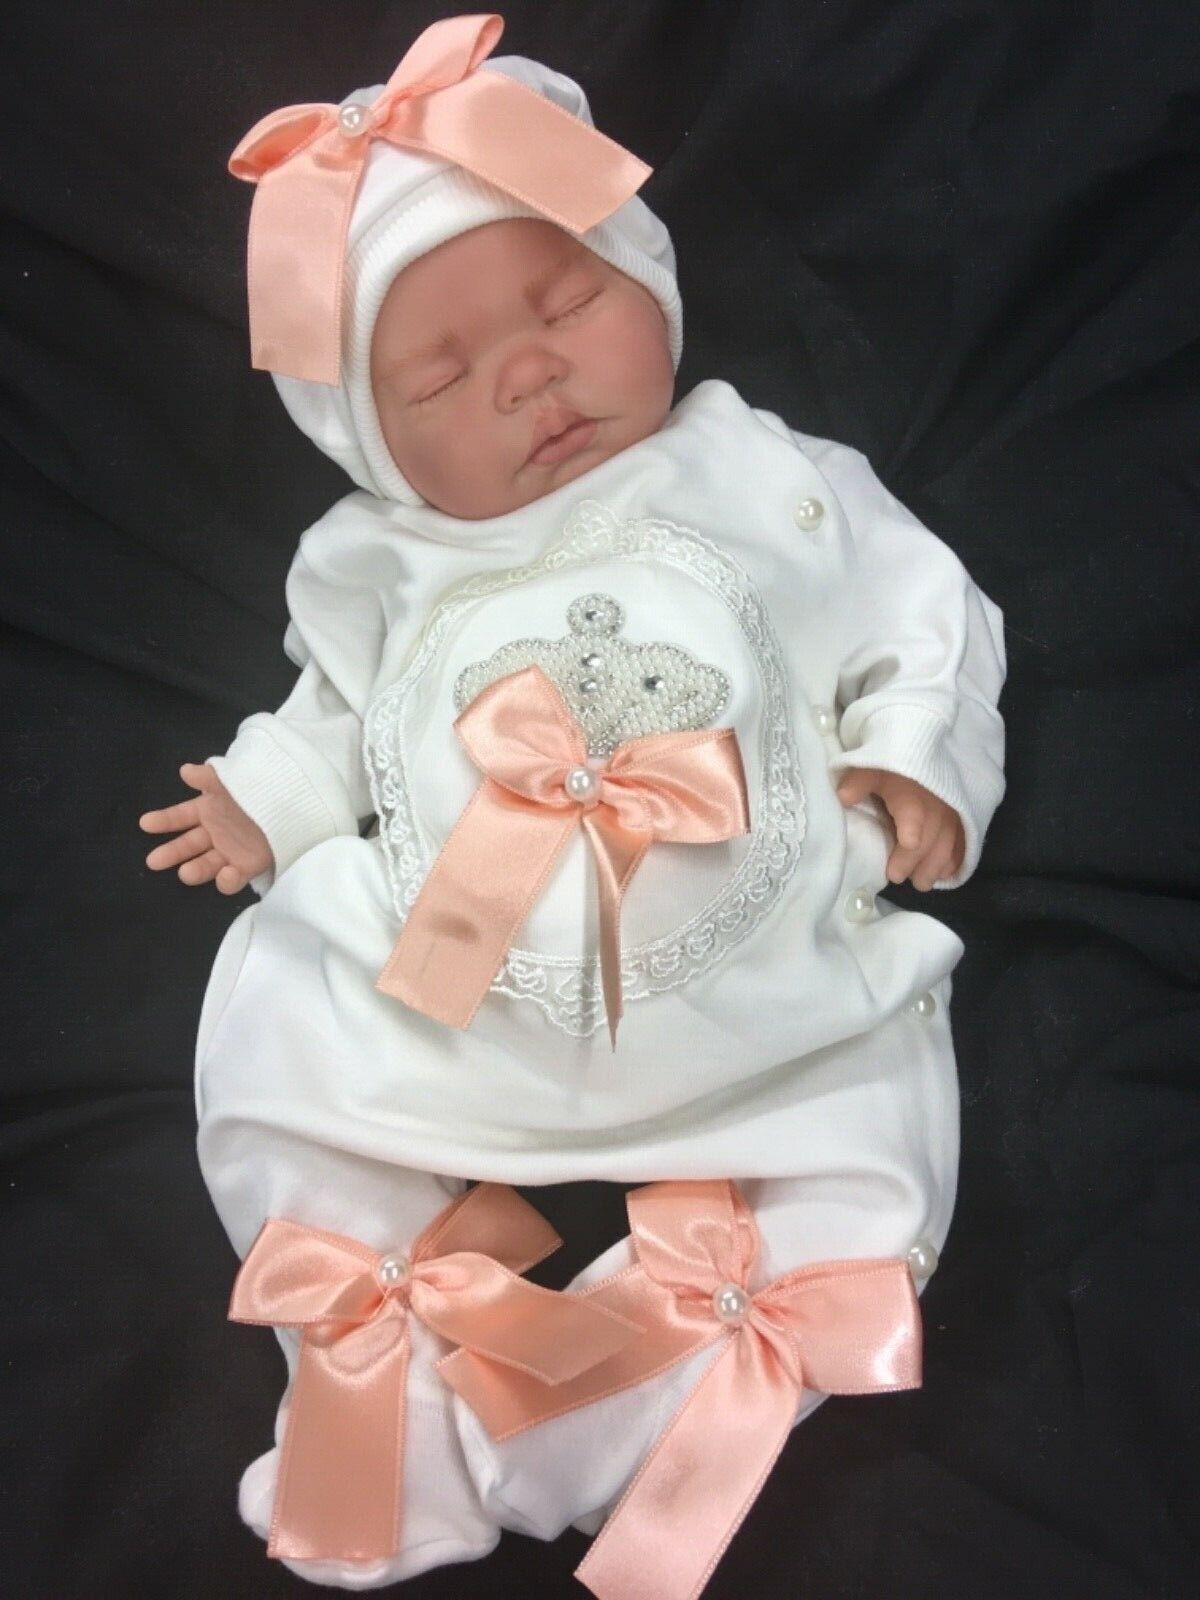 Bebé REBORN NIÑA valor pesado primero Renacido impresionante traje Blingy Romaní M